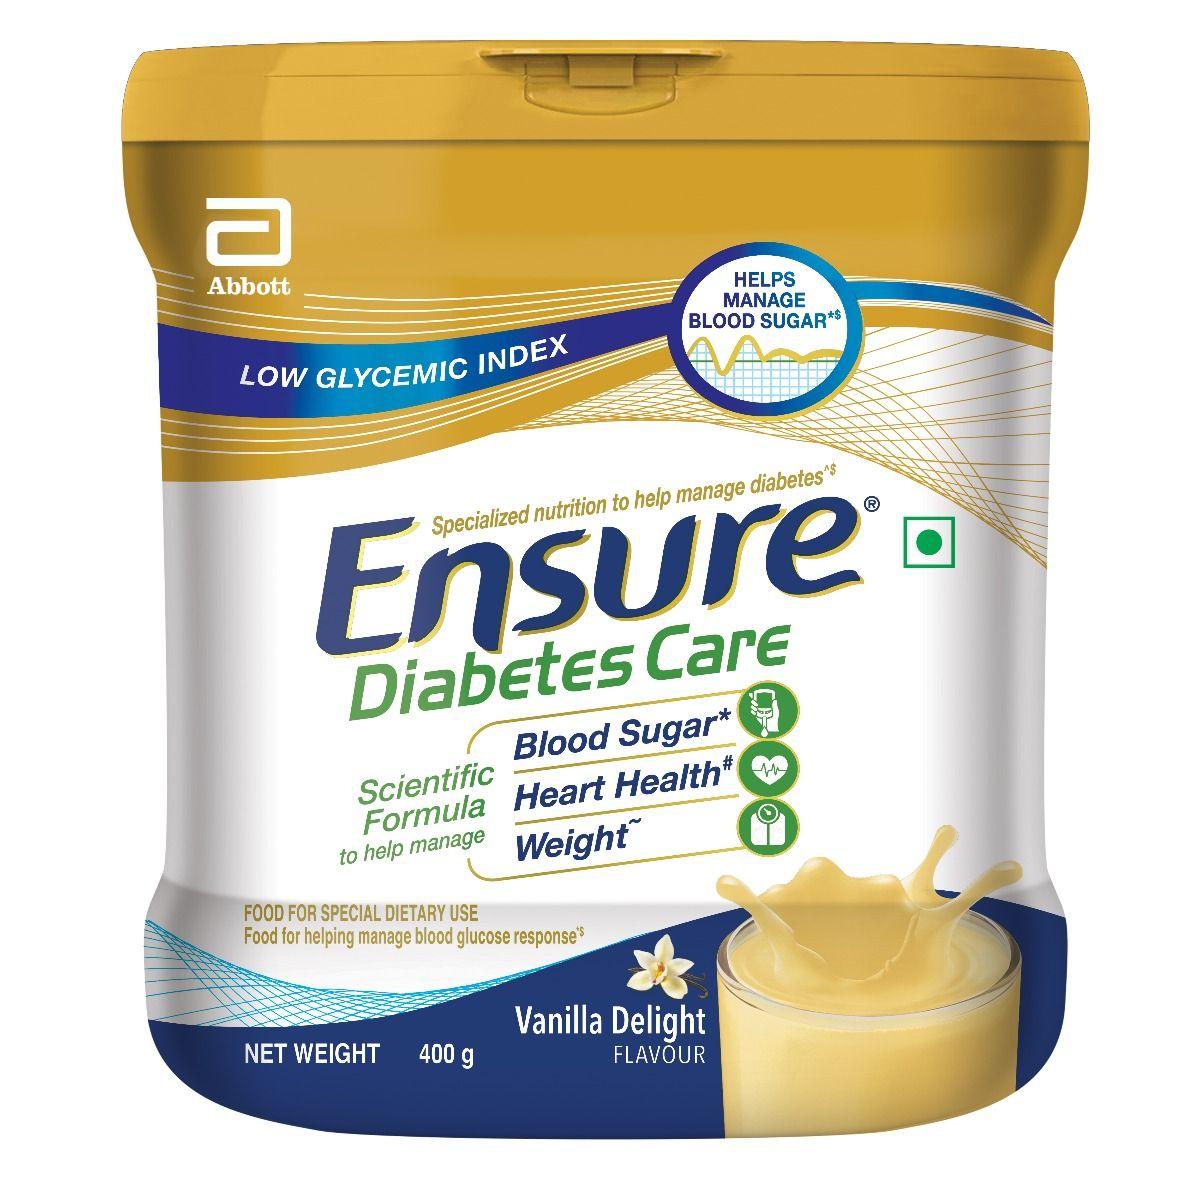 Ensure Vanilla Delight Flavoured Diabetes Care Powder, 400 gm Tin